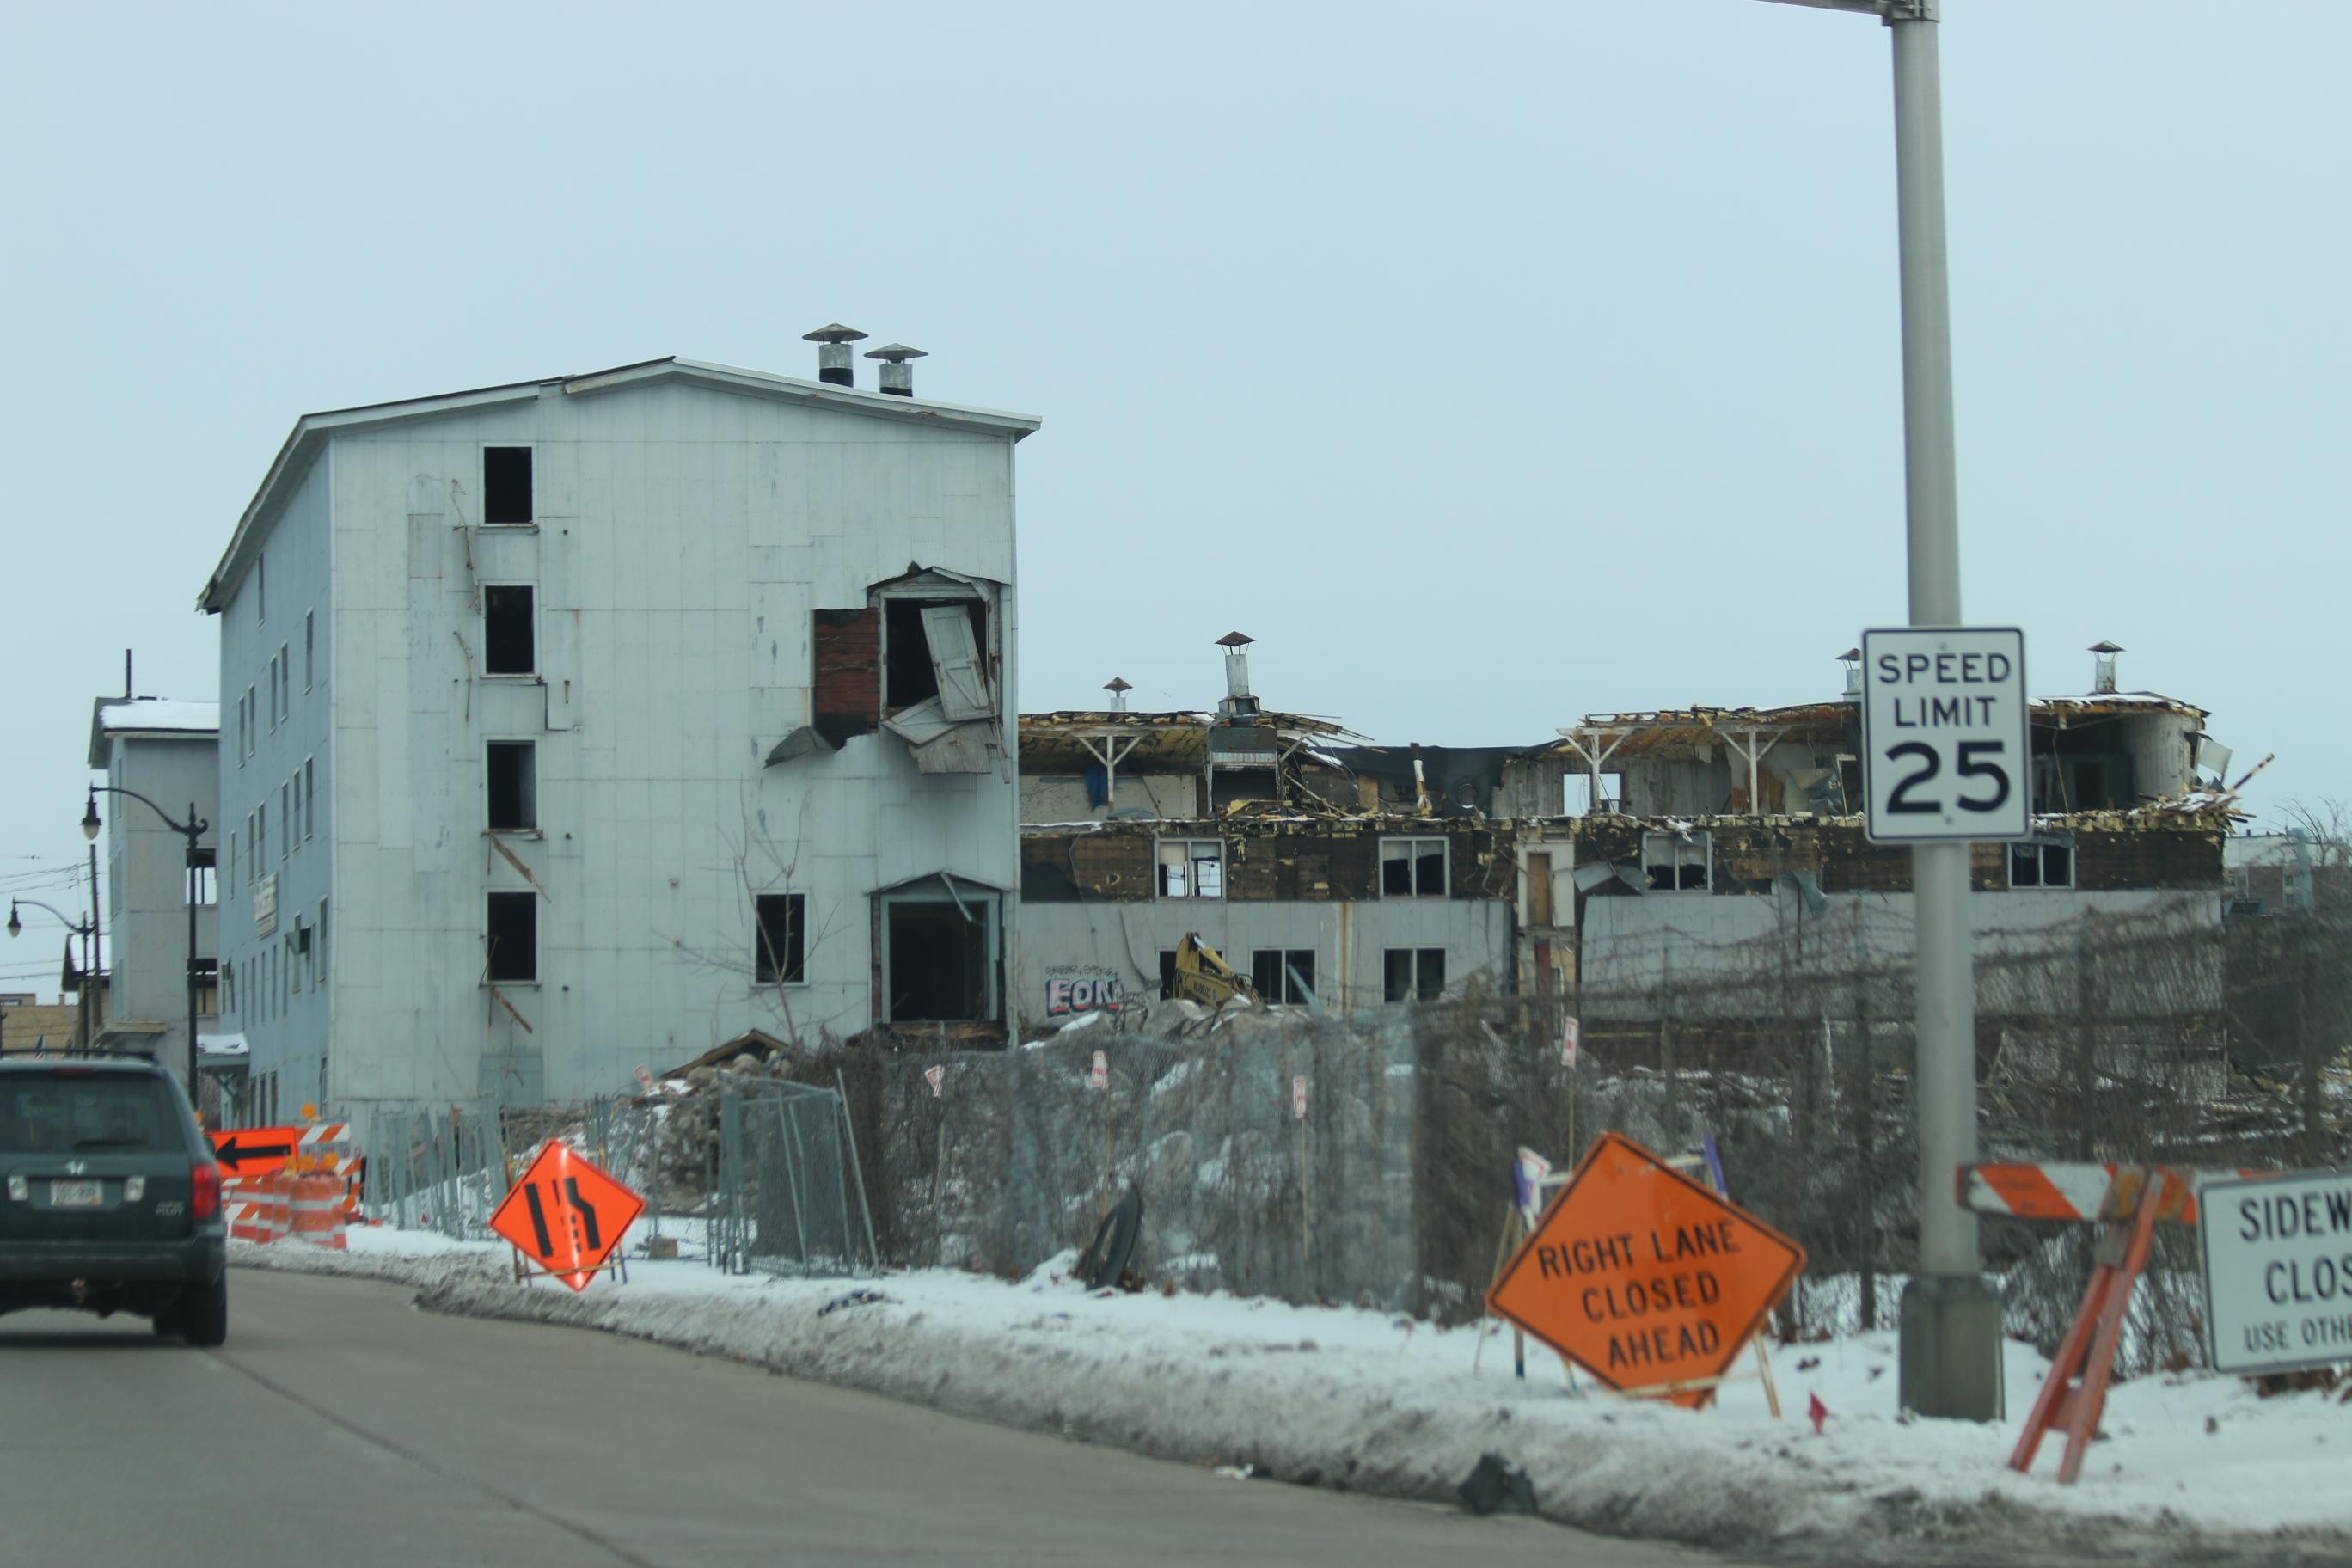 File:Oshkosh Arena Dismantlement Of Buckstaff Furniture Building Feb  2017